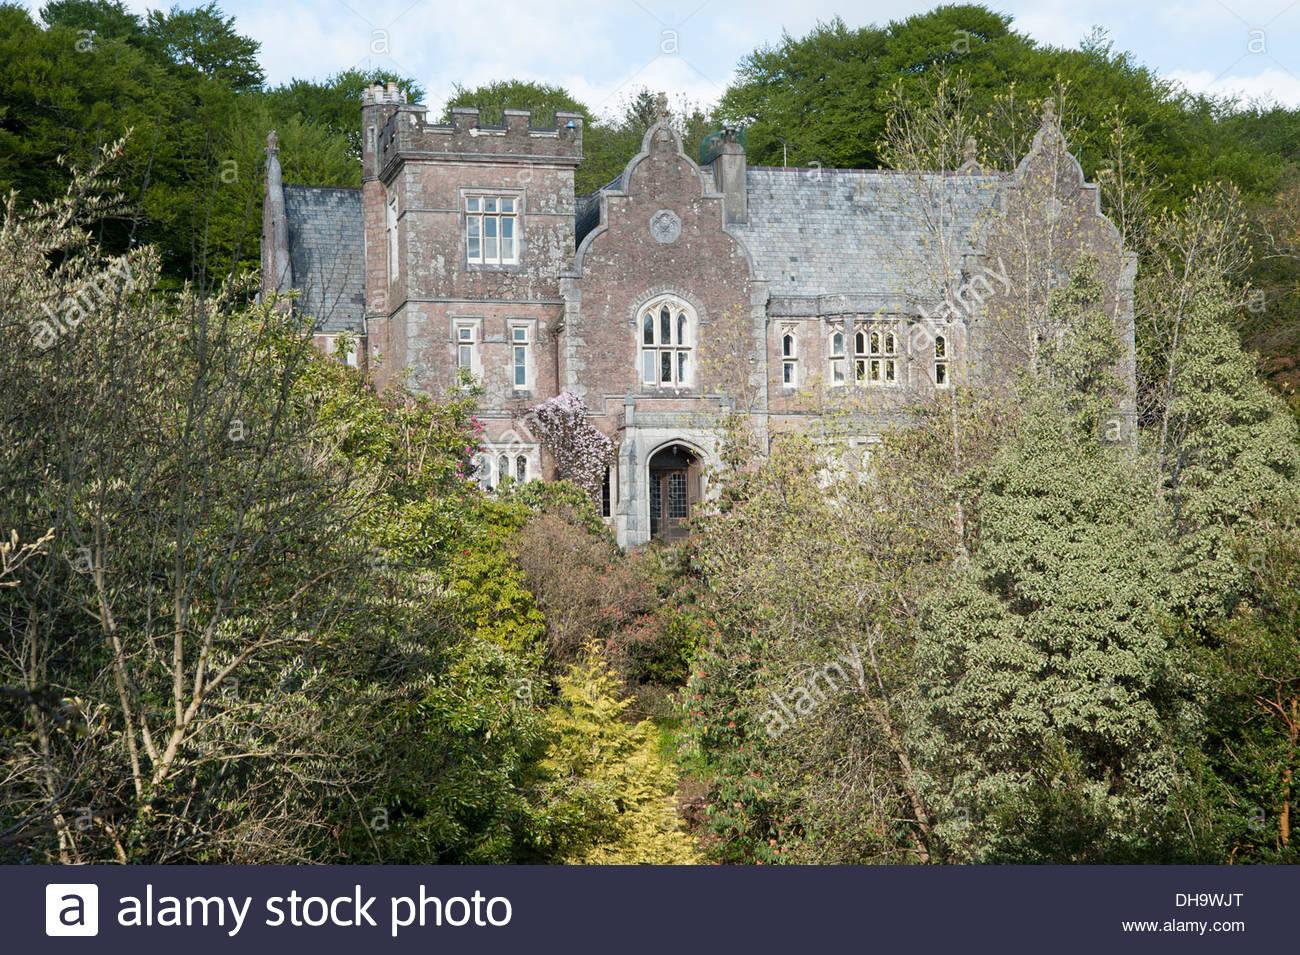 The Victorian Gothic House Built 1862 As A Hunting Lodge Lukesland Ivybridge Devon UK